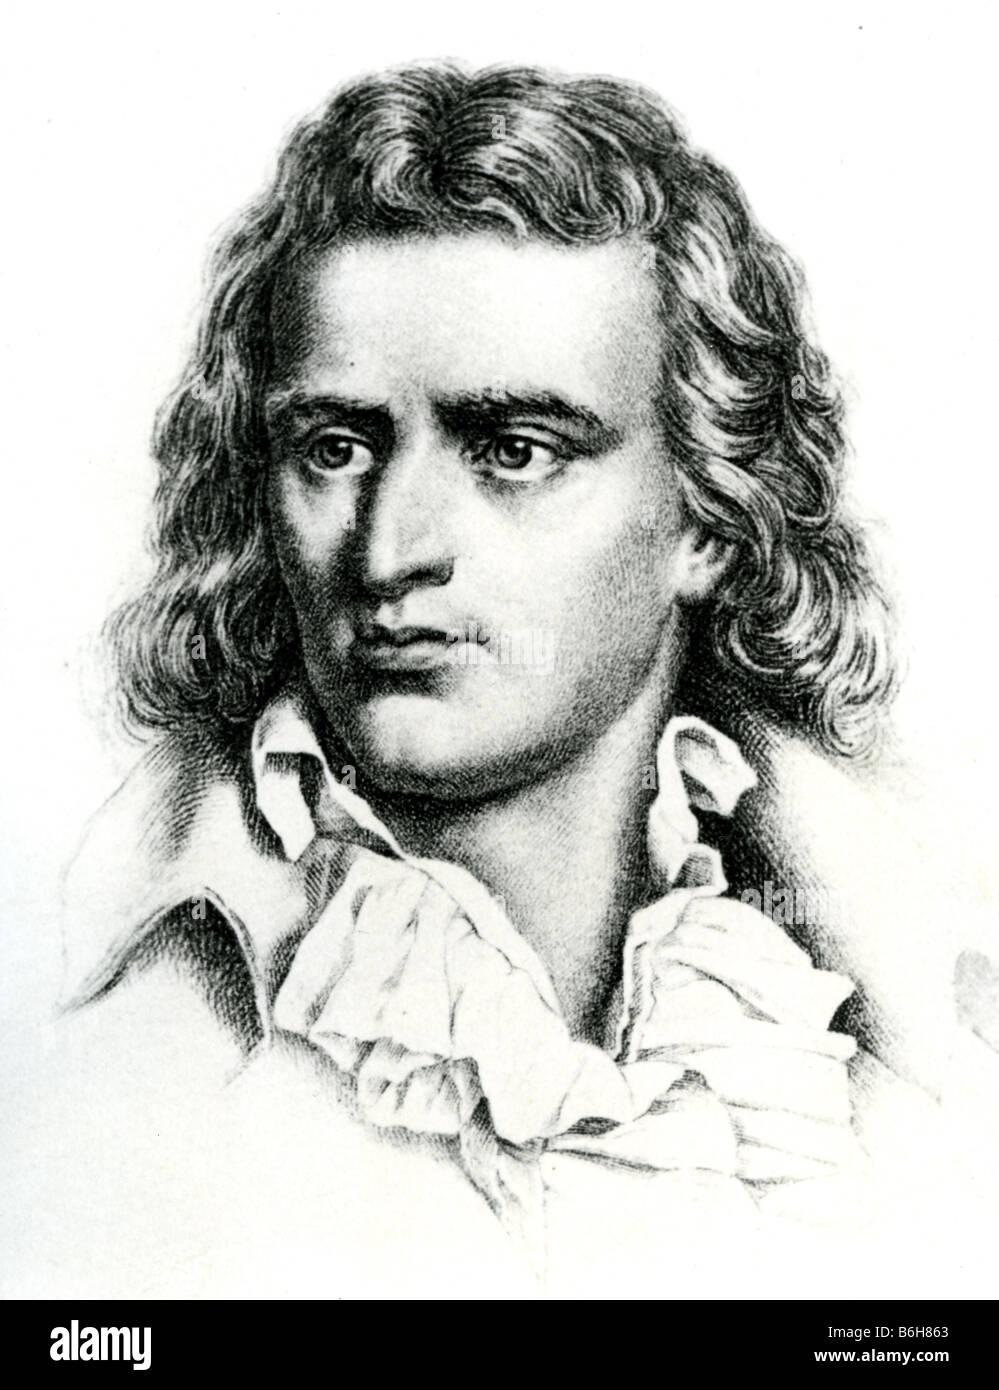 FRIEDRICH SCHILLER German dramatist and poet - Stock Image